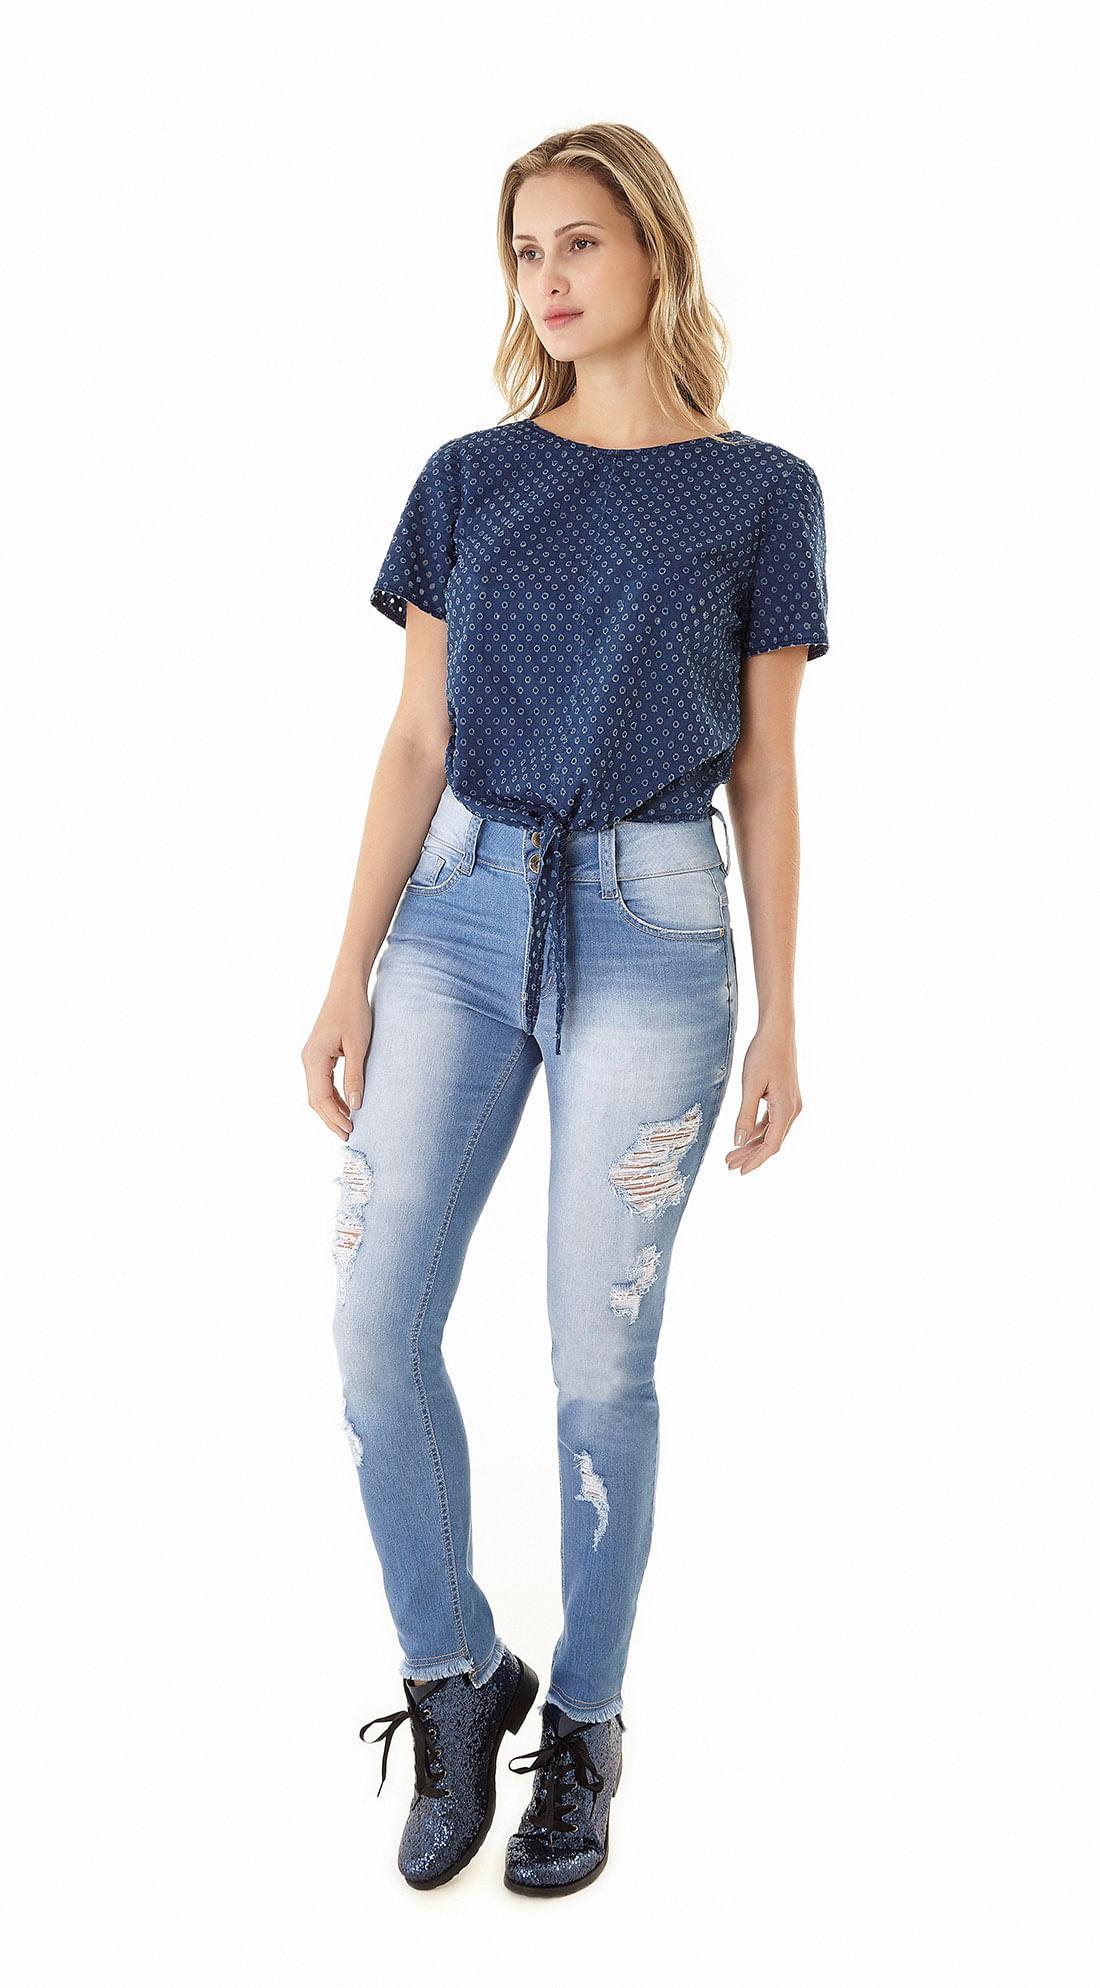 9fc88f56c Calca Jeans Skinny Regular Barra Irregular Jeans - Zinco